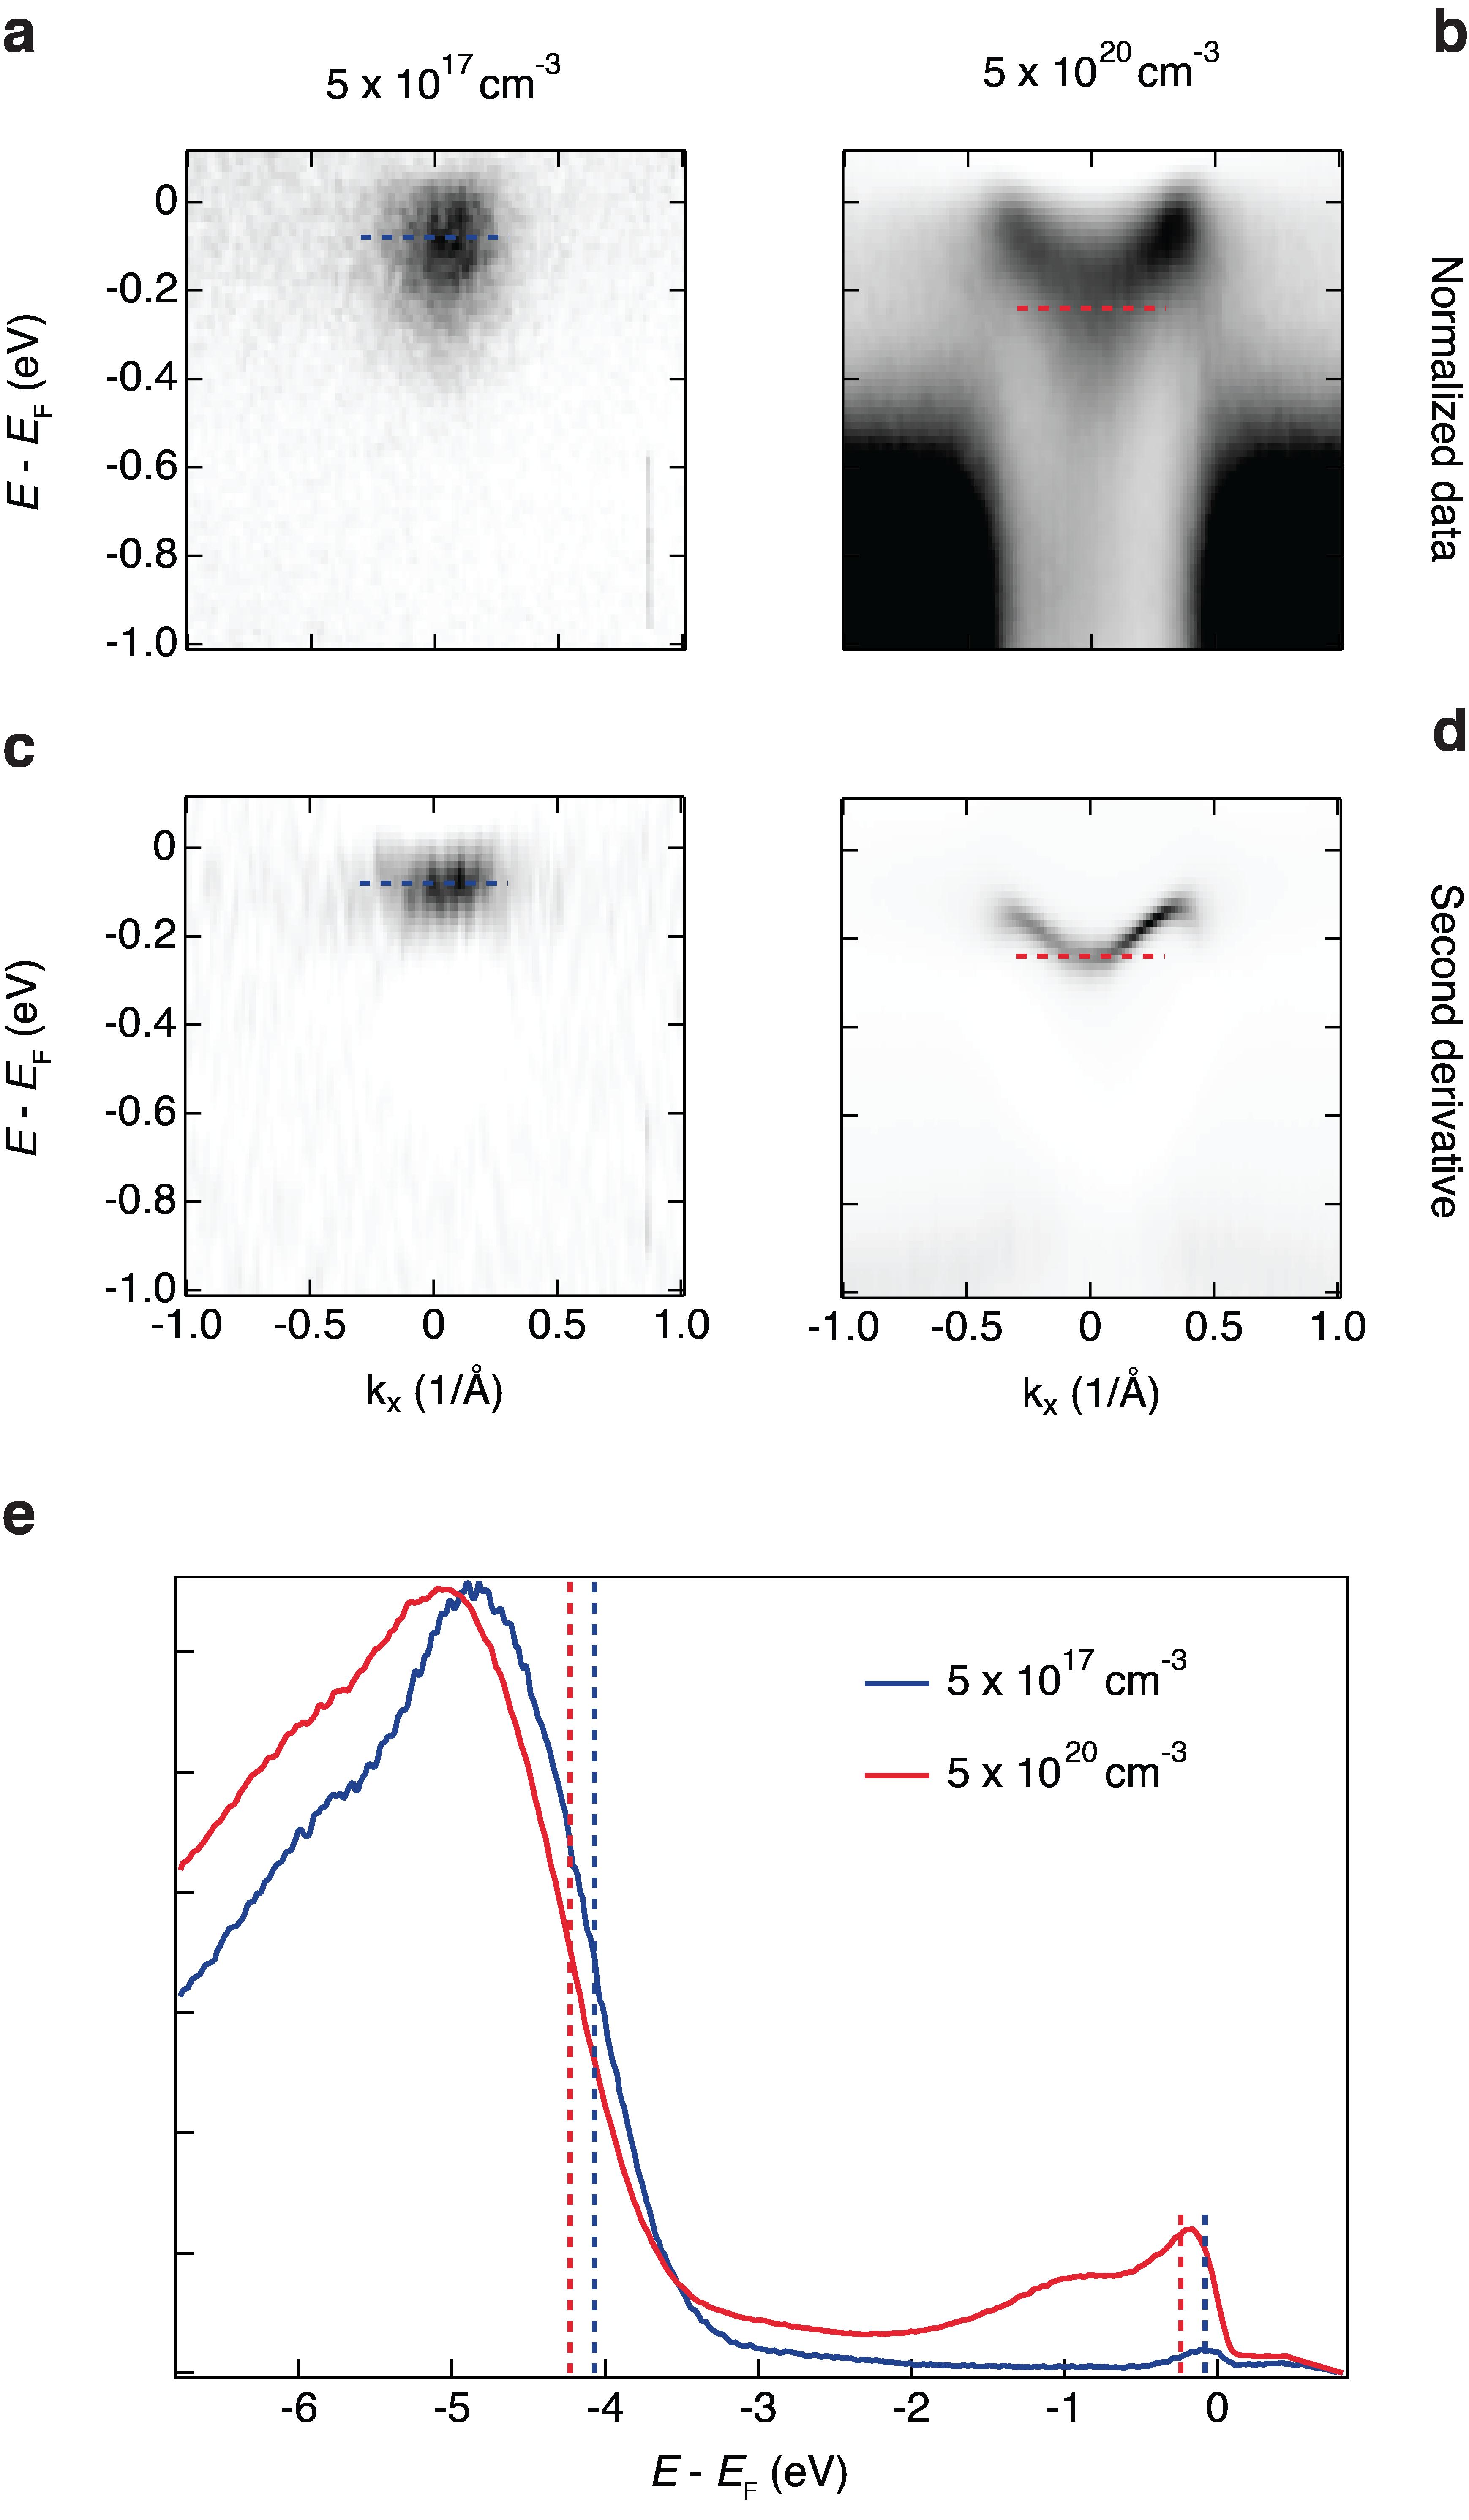 Energy vs. momentum dispersion of the bottom of the CB for